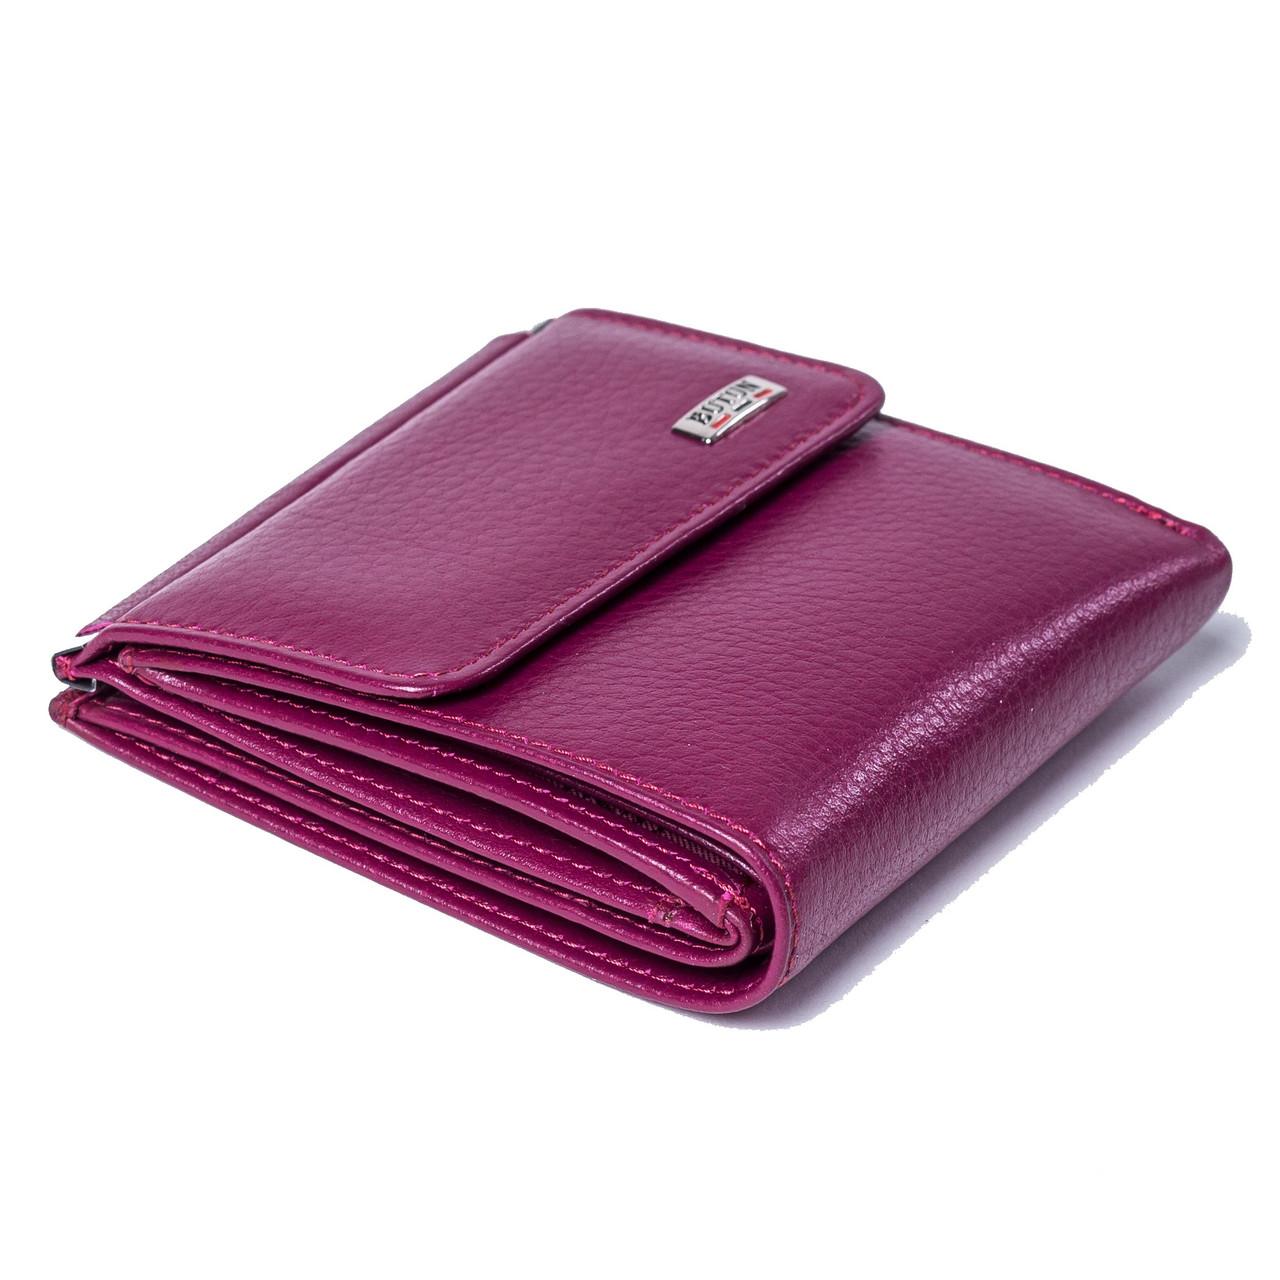 Женский кошелек BUTUN 590-004-005 кожаный марсала